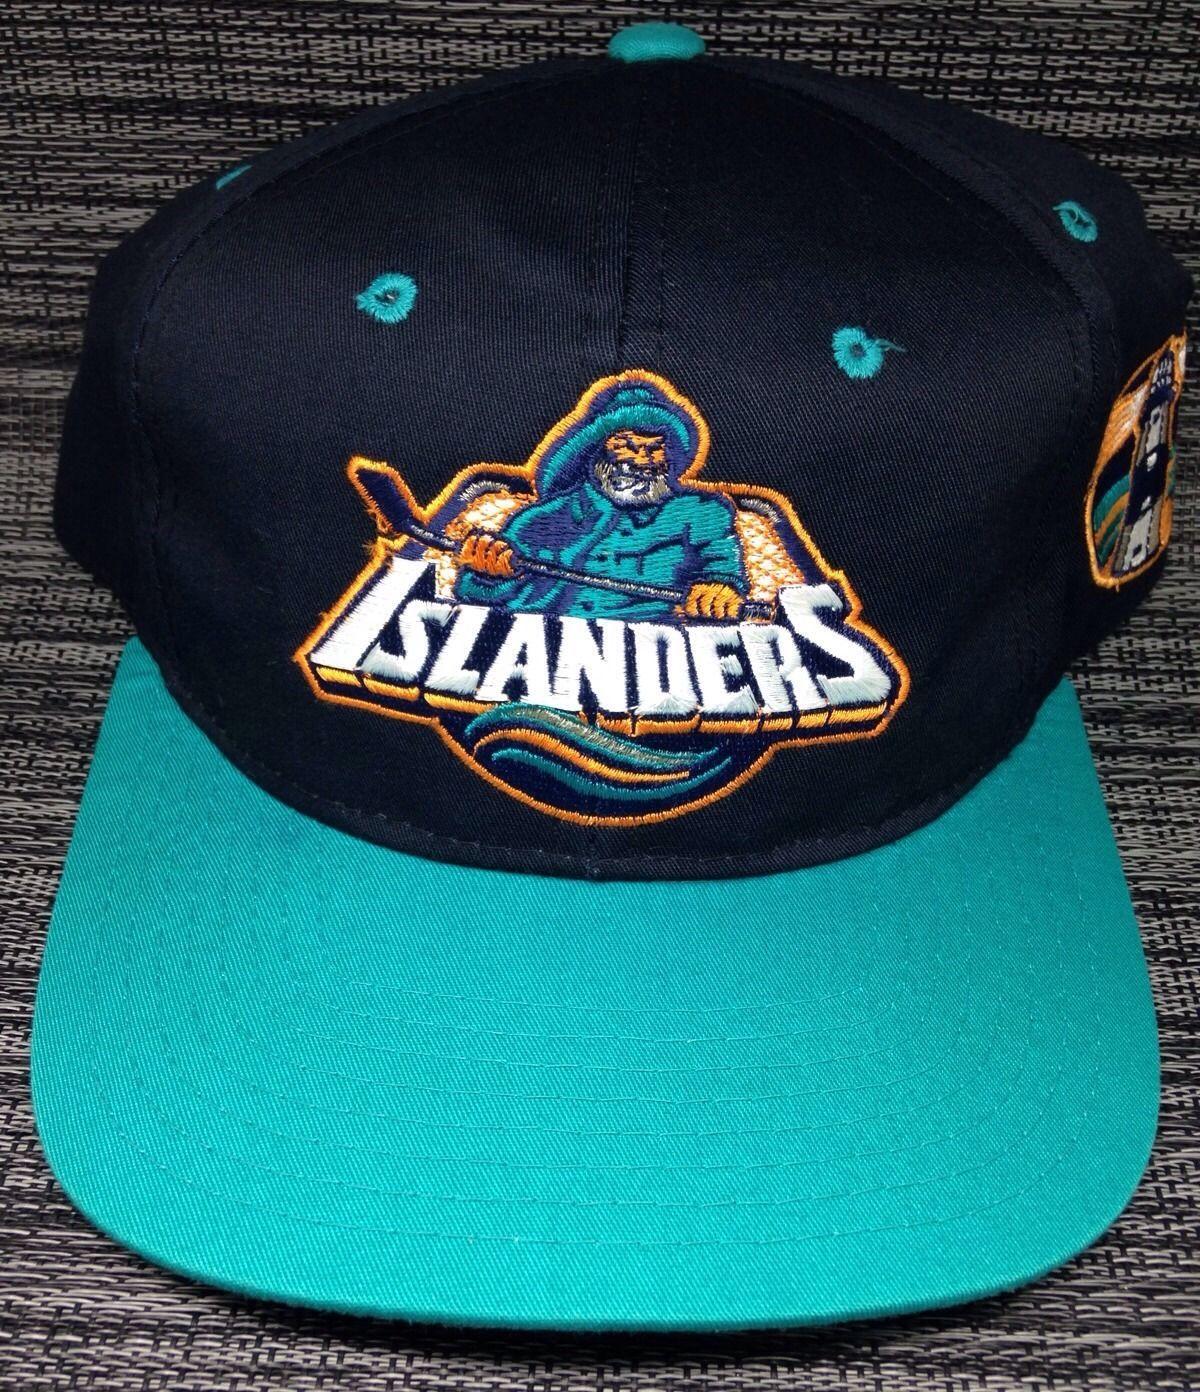 ... clearance new york islanders hat vintage 1995 nhl cap starter snapback  ebay 24f70 56c8b b8a940c4c7b